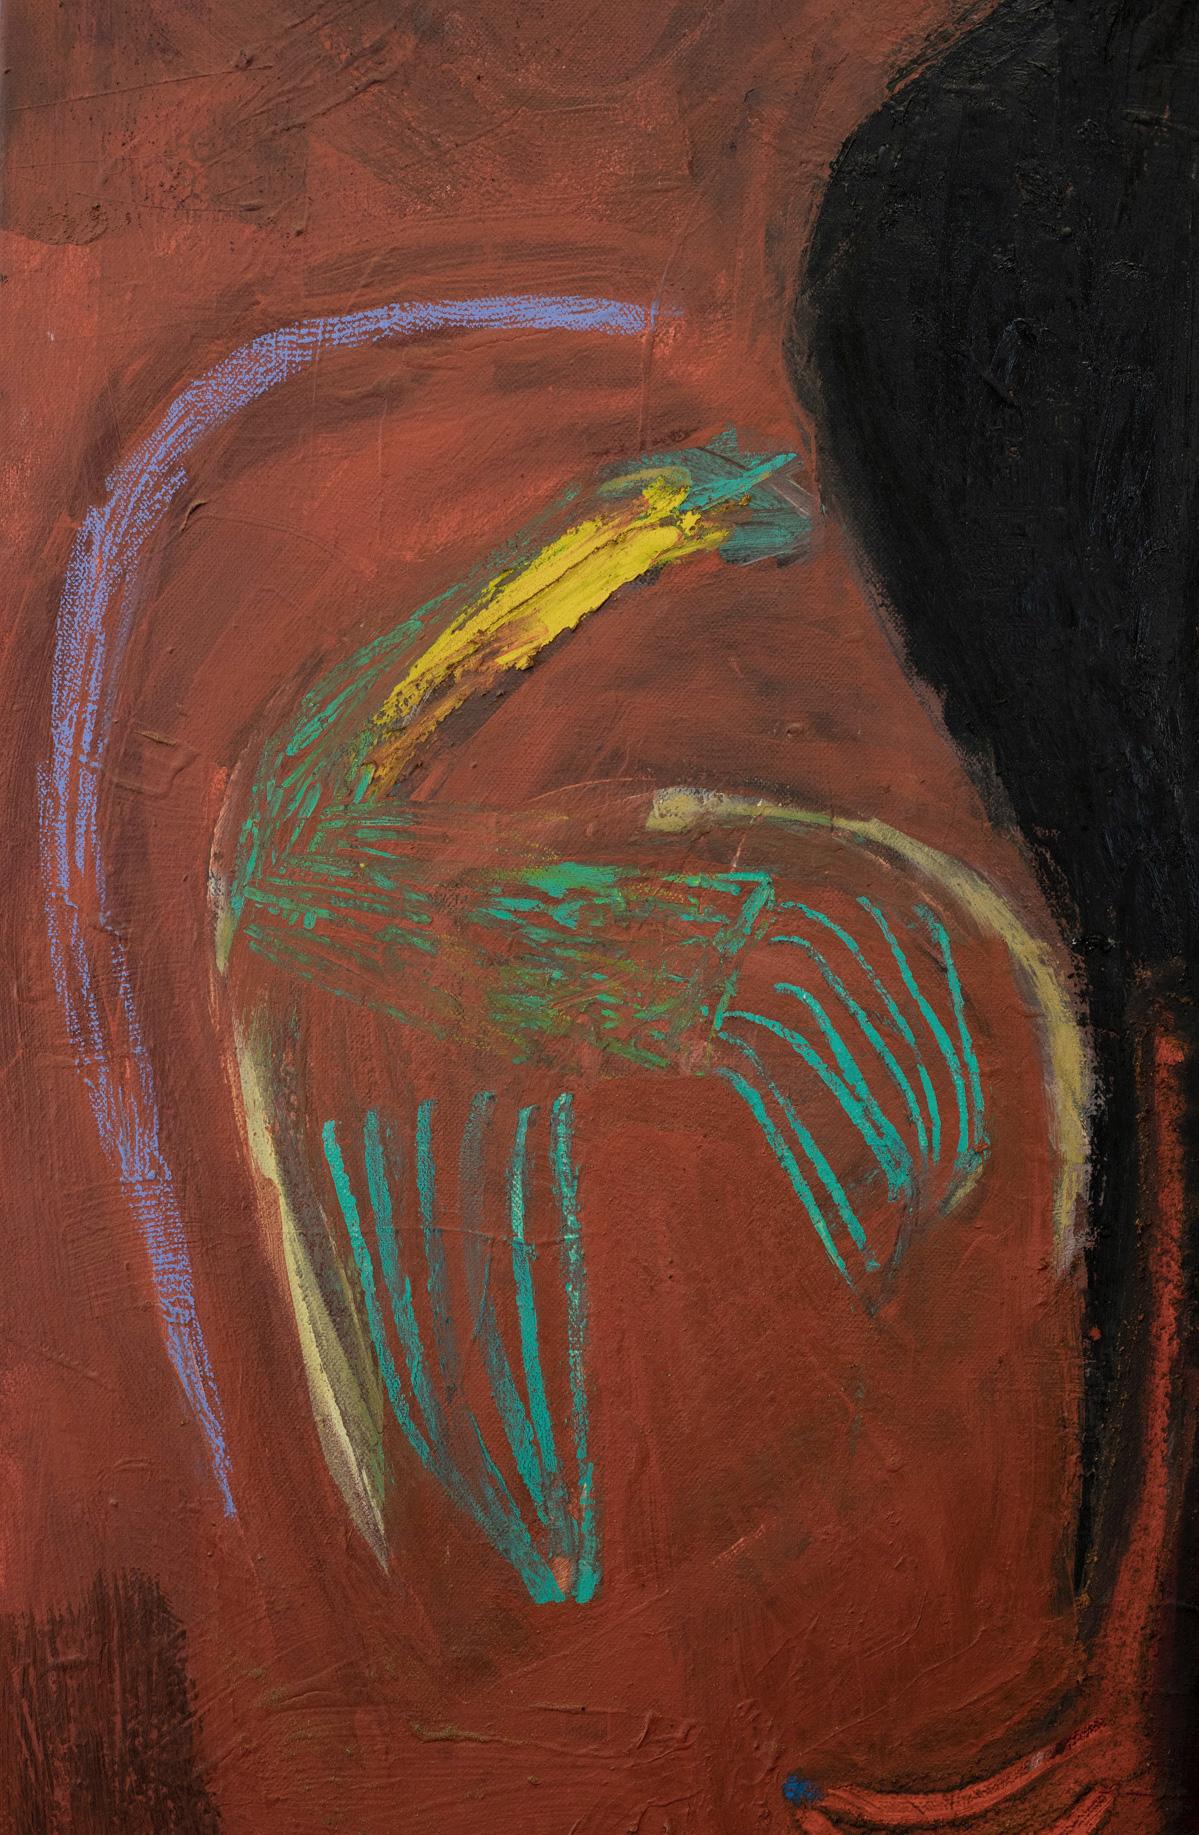 james watkins melania toma painters abstract london0005